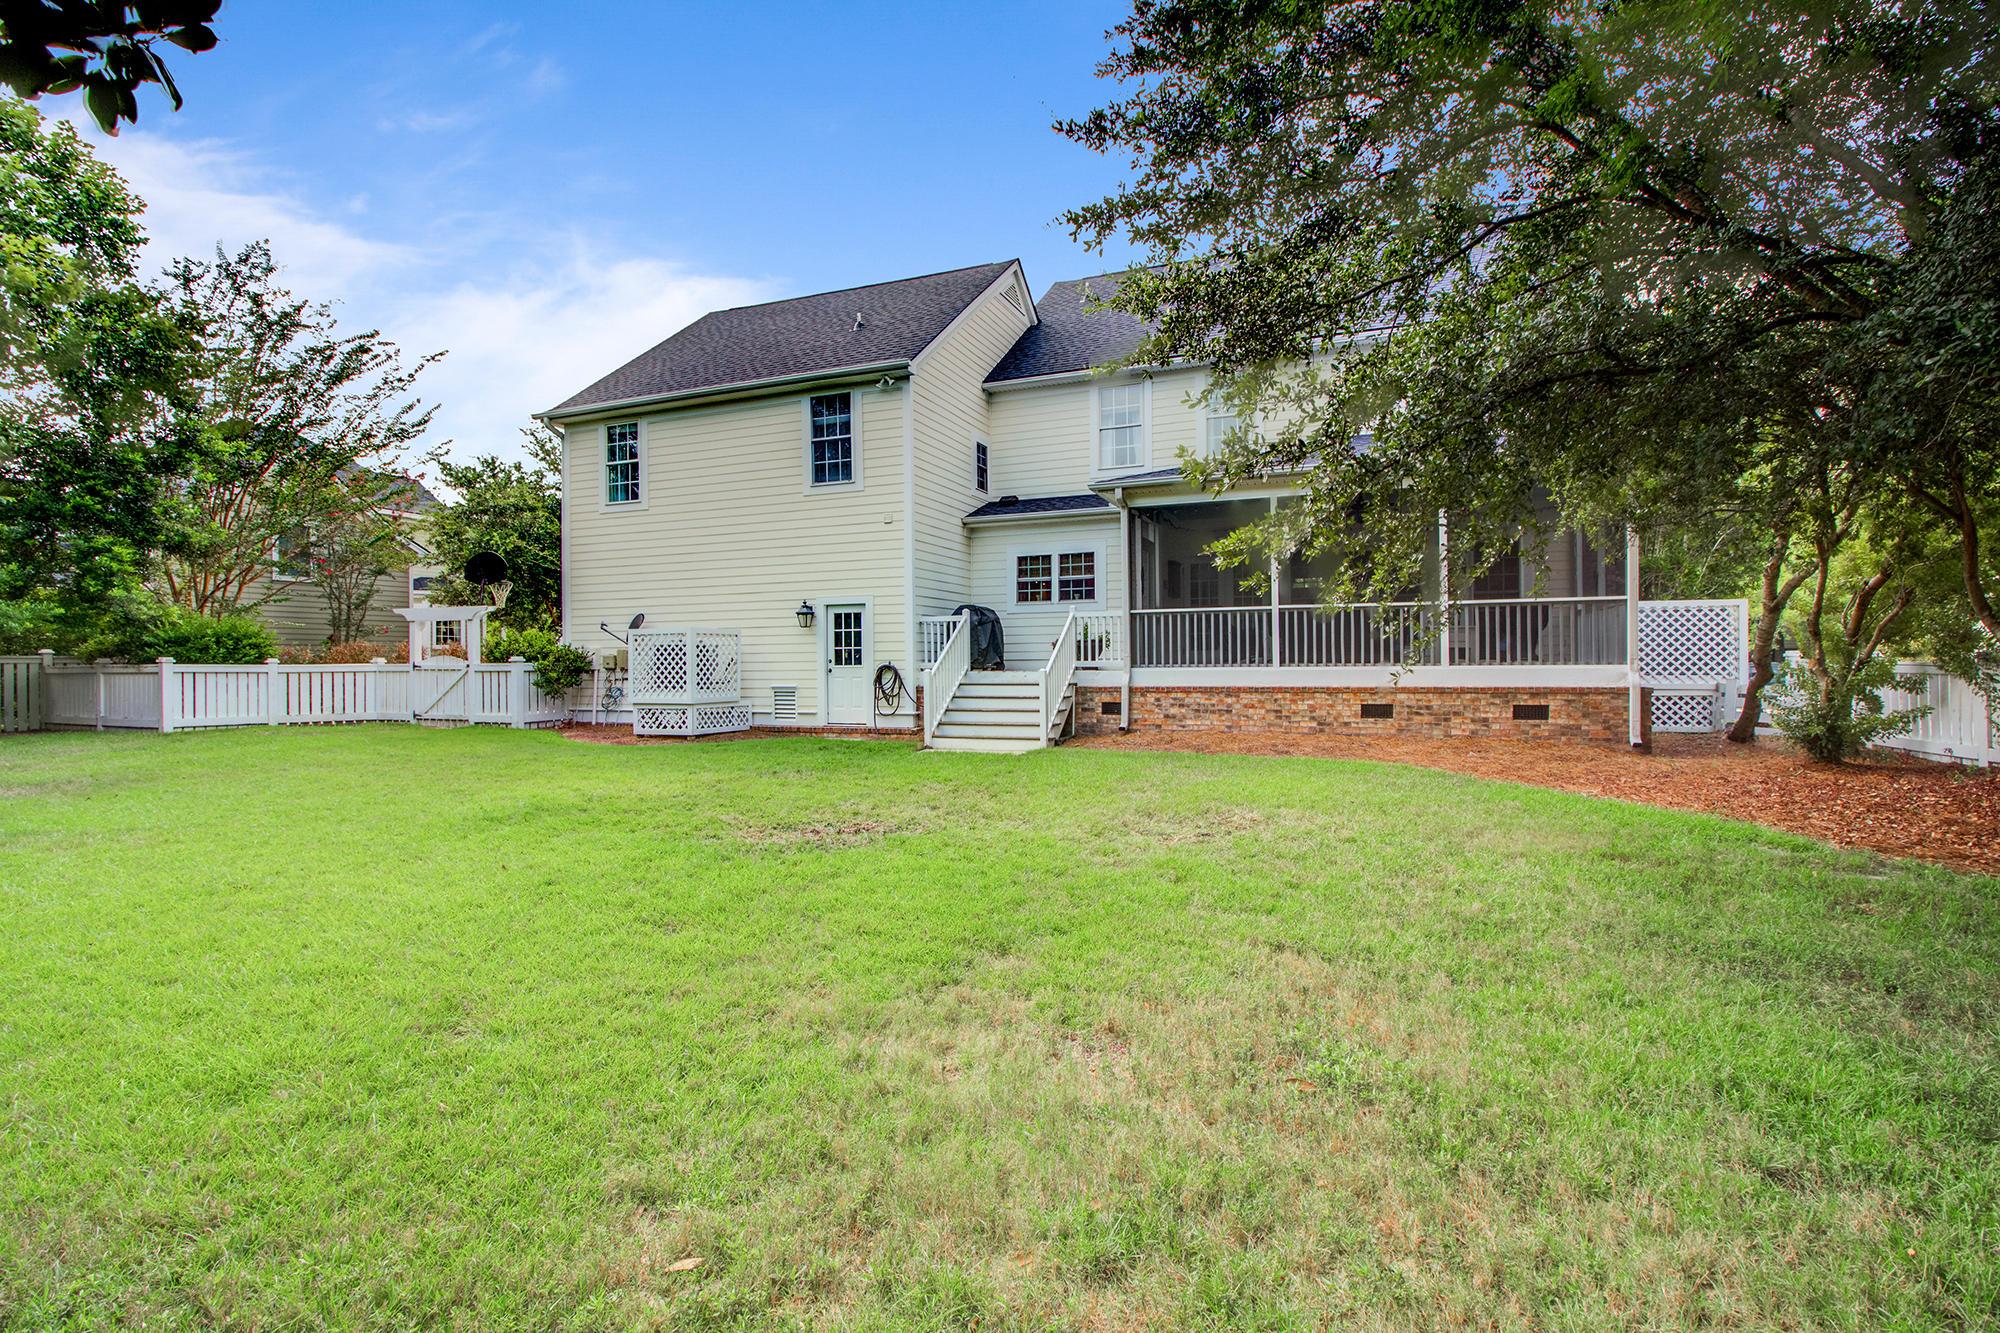 Codners Ferry Park Homes For Sale - 227 Fairchild, Daniel Island, SC - 30